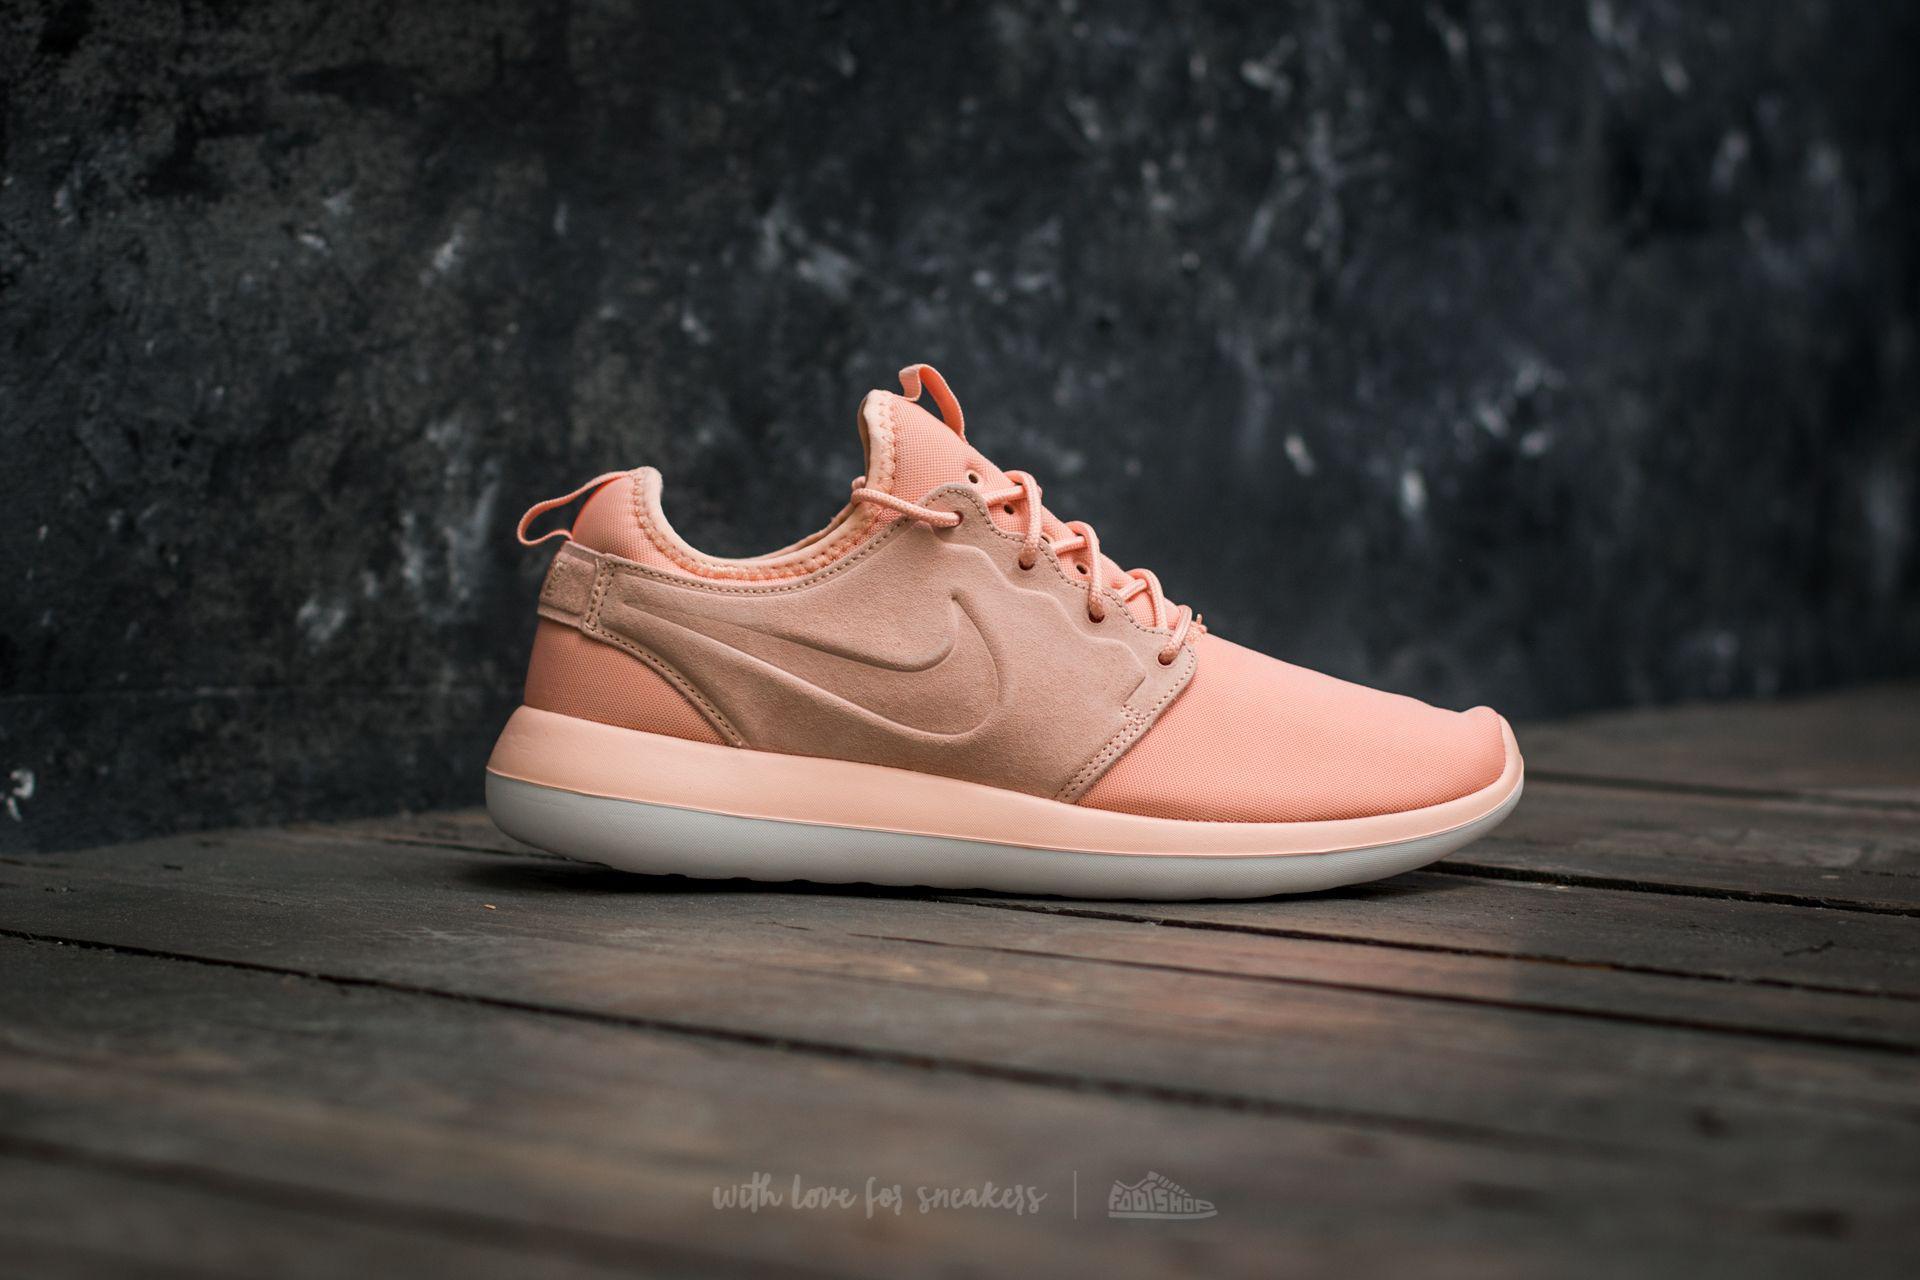 59a7539a52 ... Lyst - Nike Roshe Two Br Arctic Orange Arctic Orange for Men ...